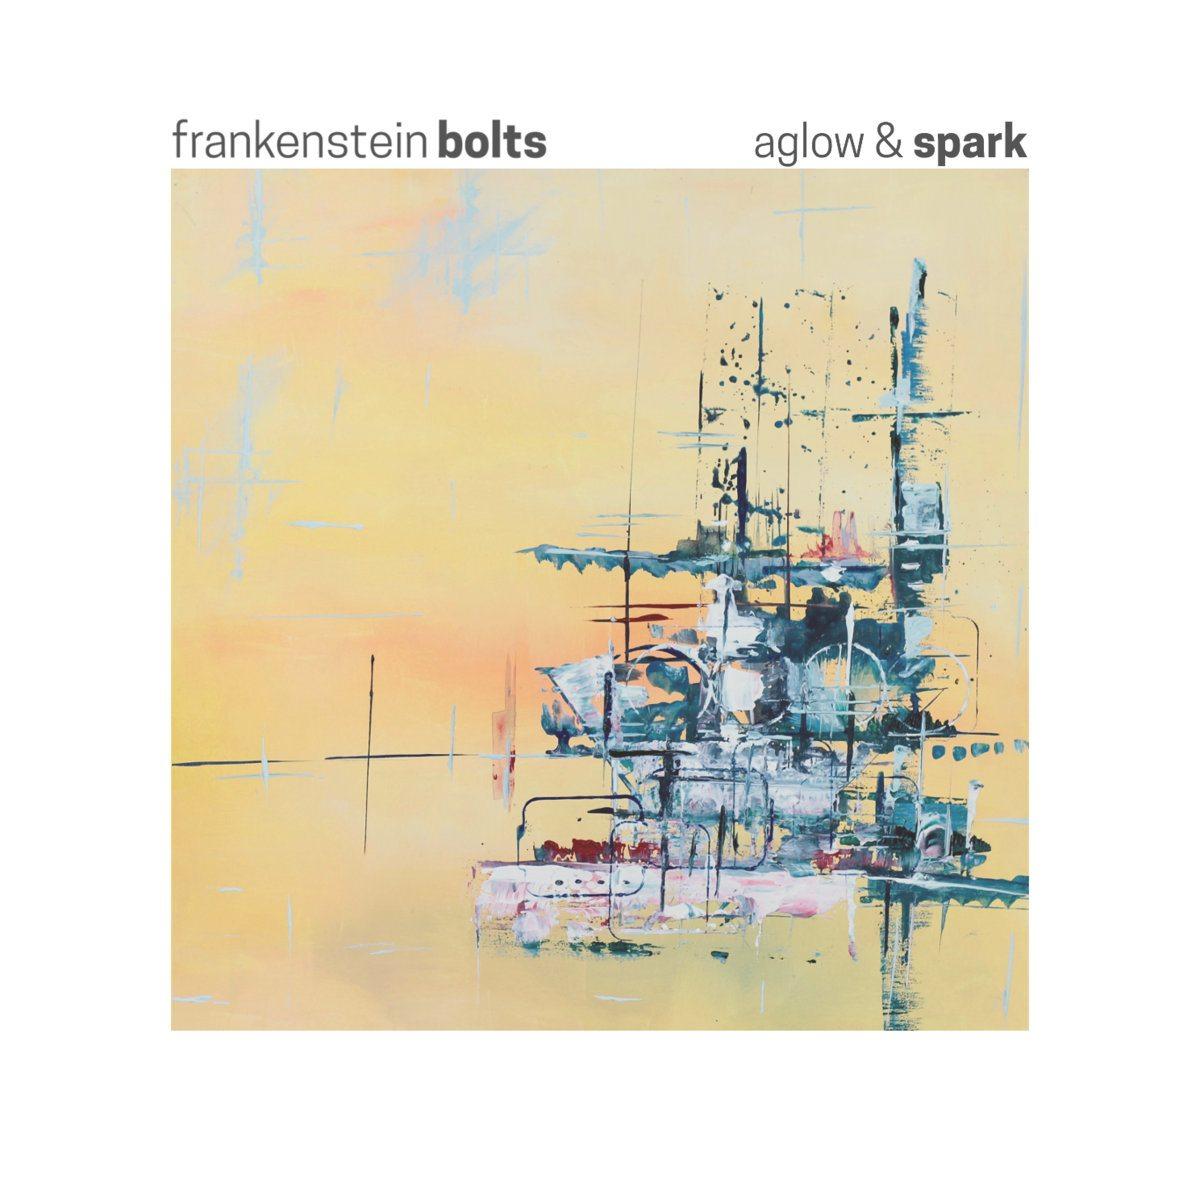 Frankensteinbolts Aglow & Sparks